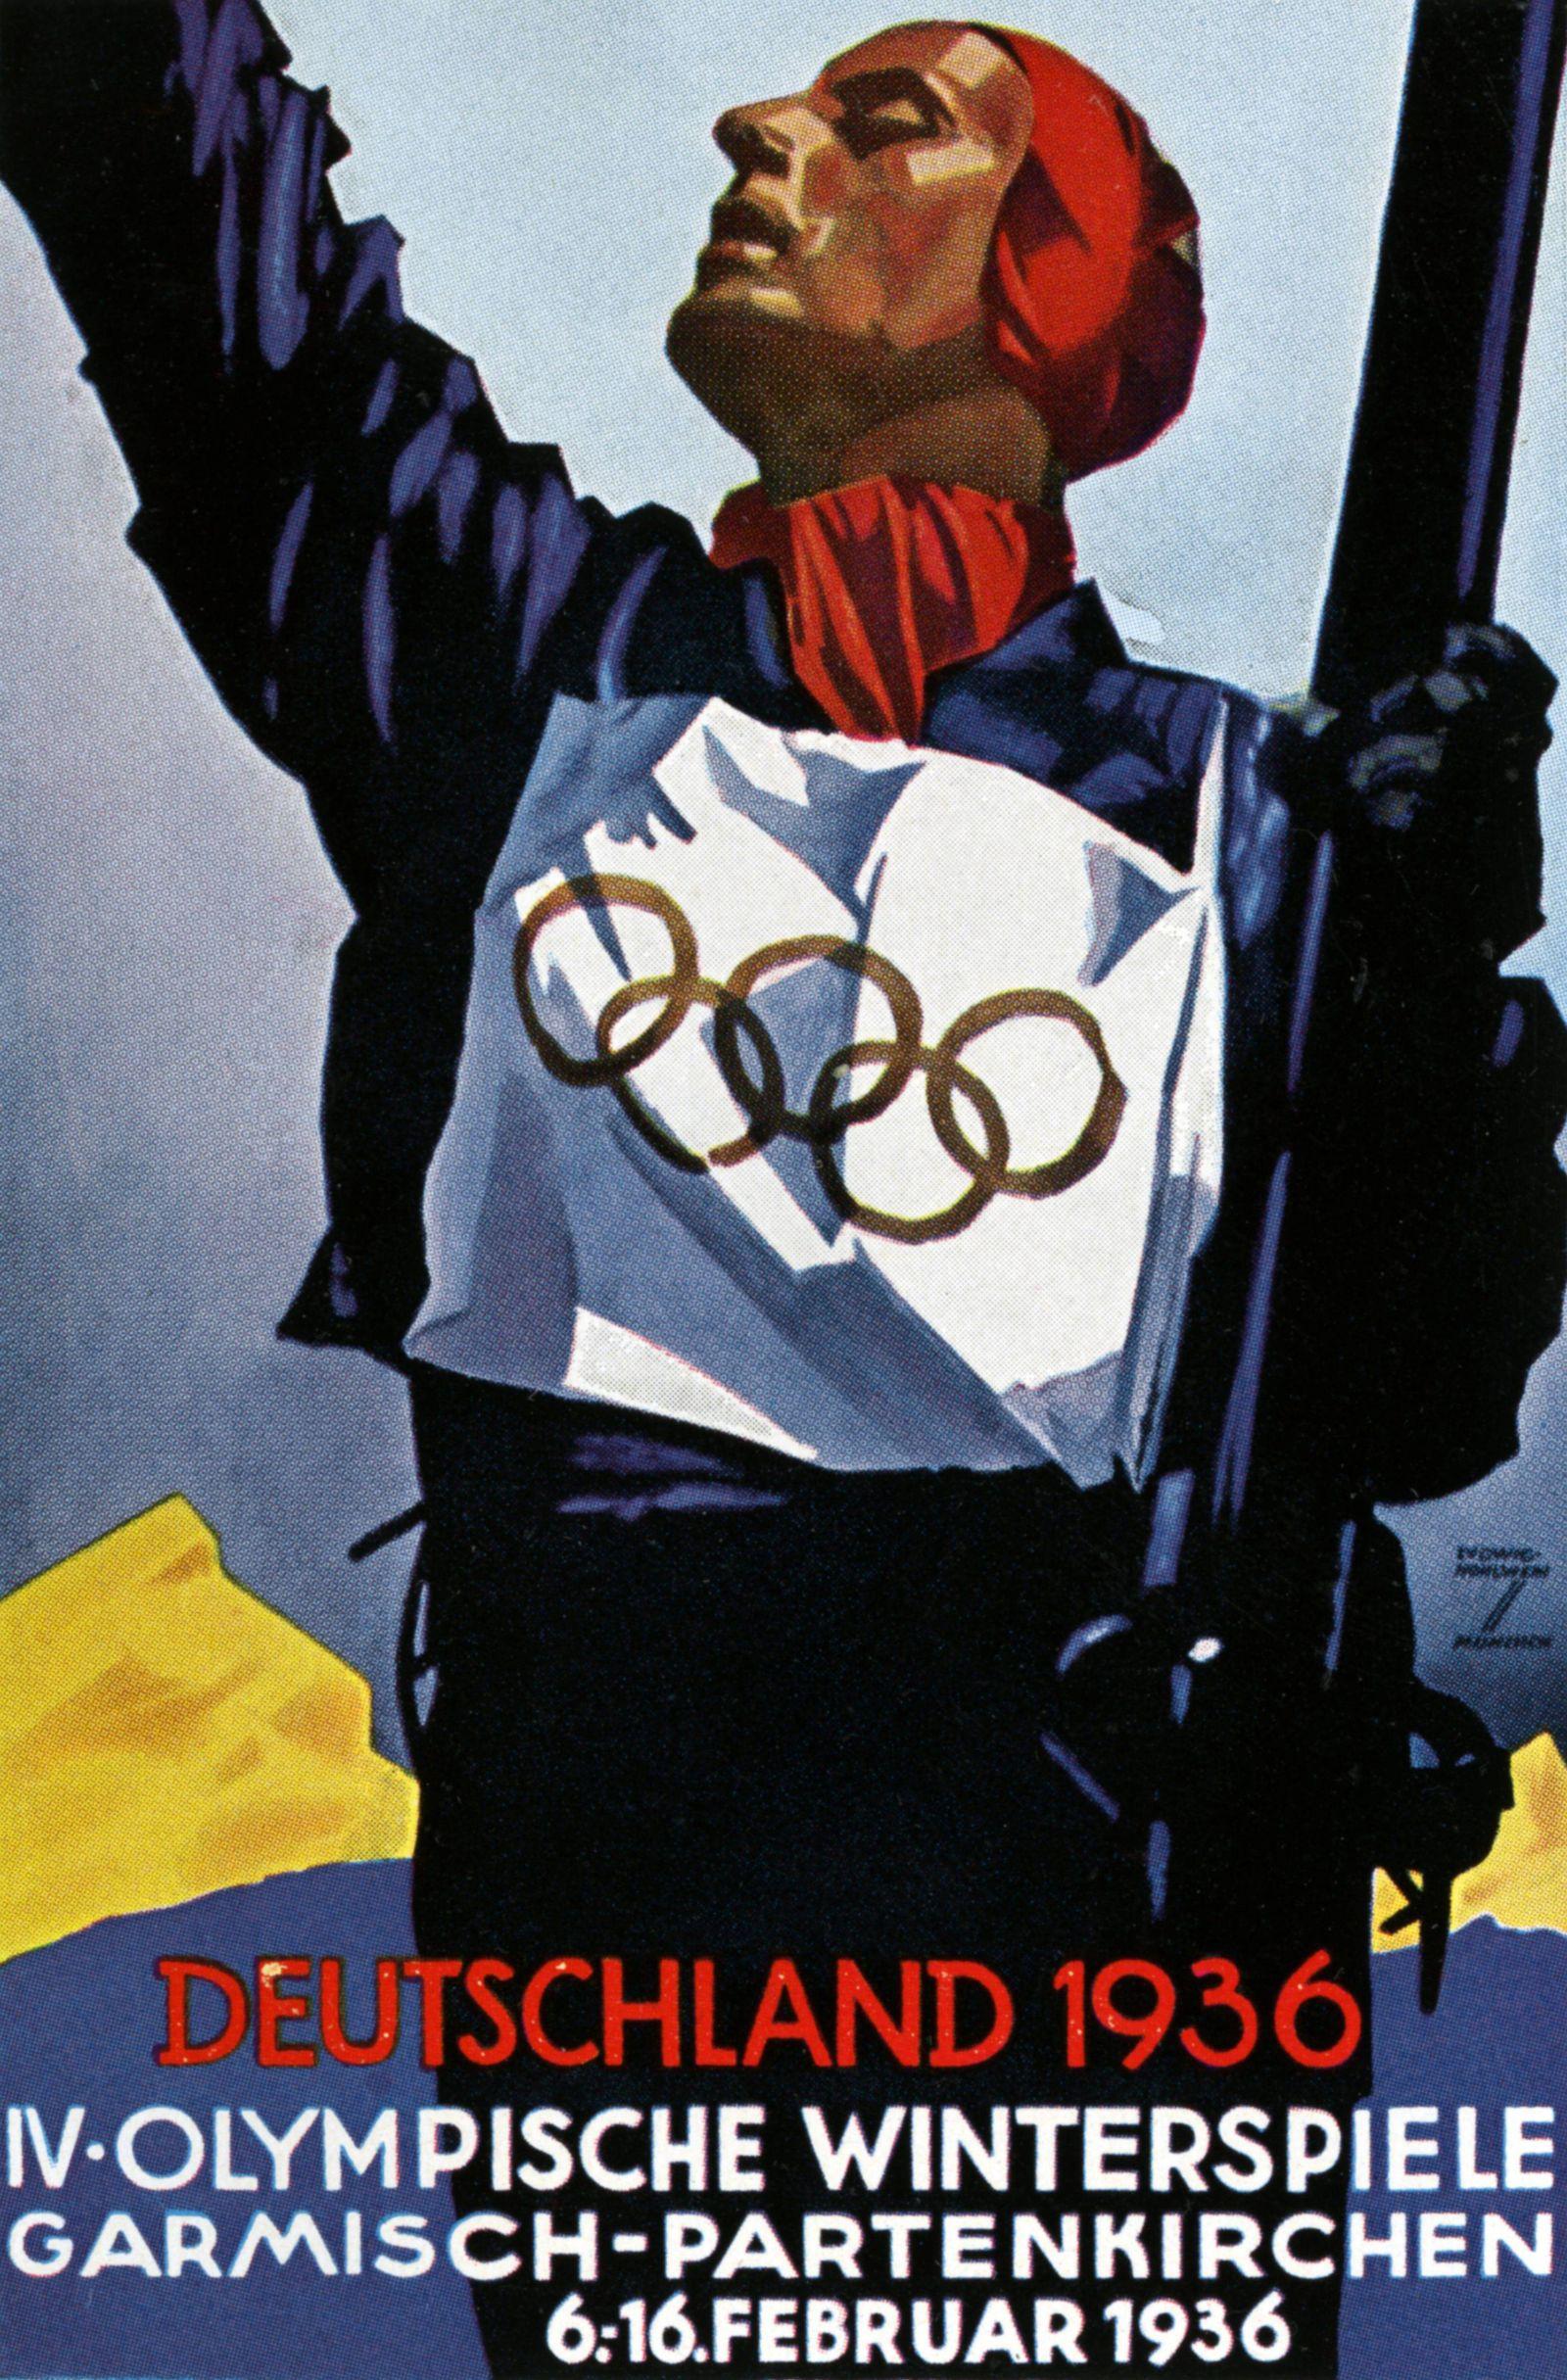 Germany 1936 IV Winter Olympics at Garmisch Partenkirchen 6 16 February 1936 German propaganda